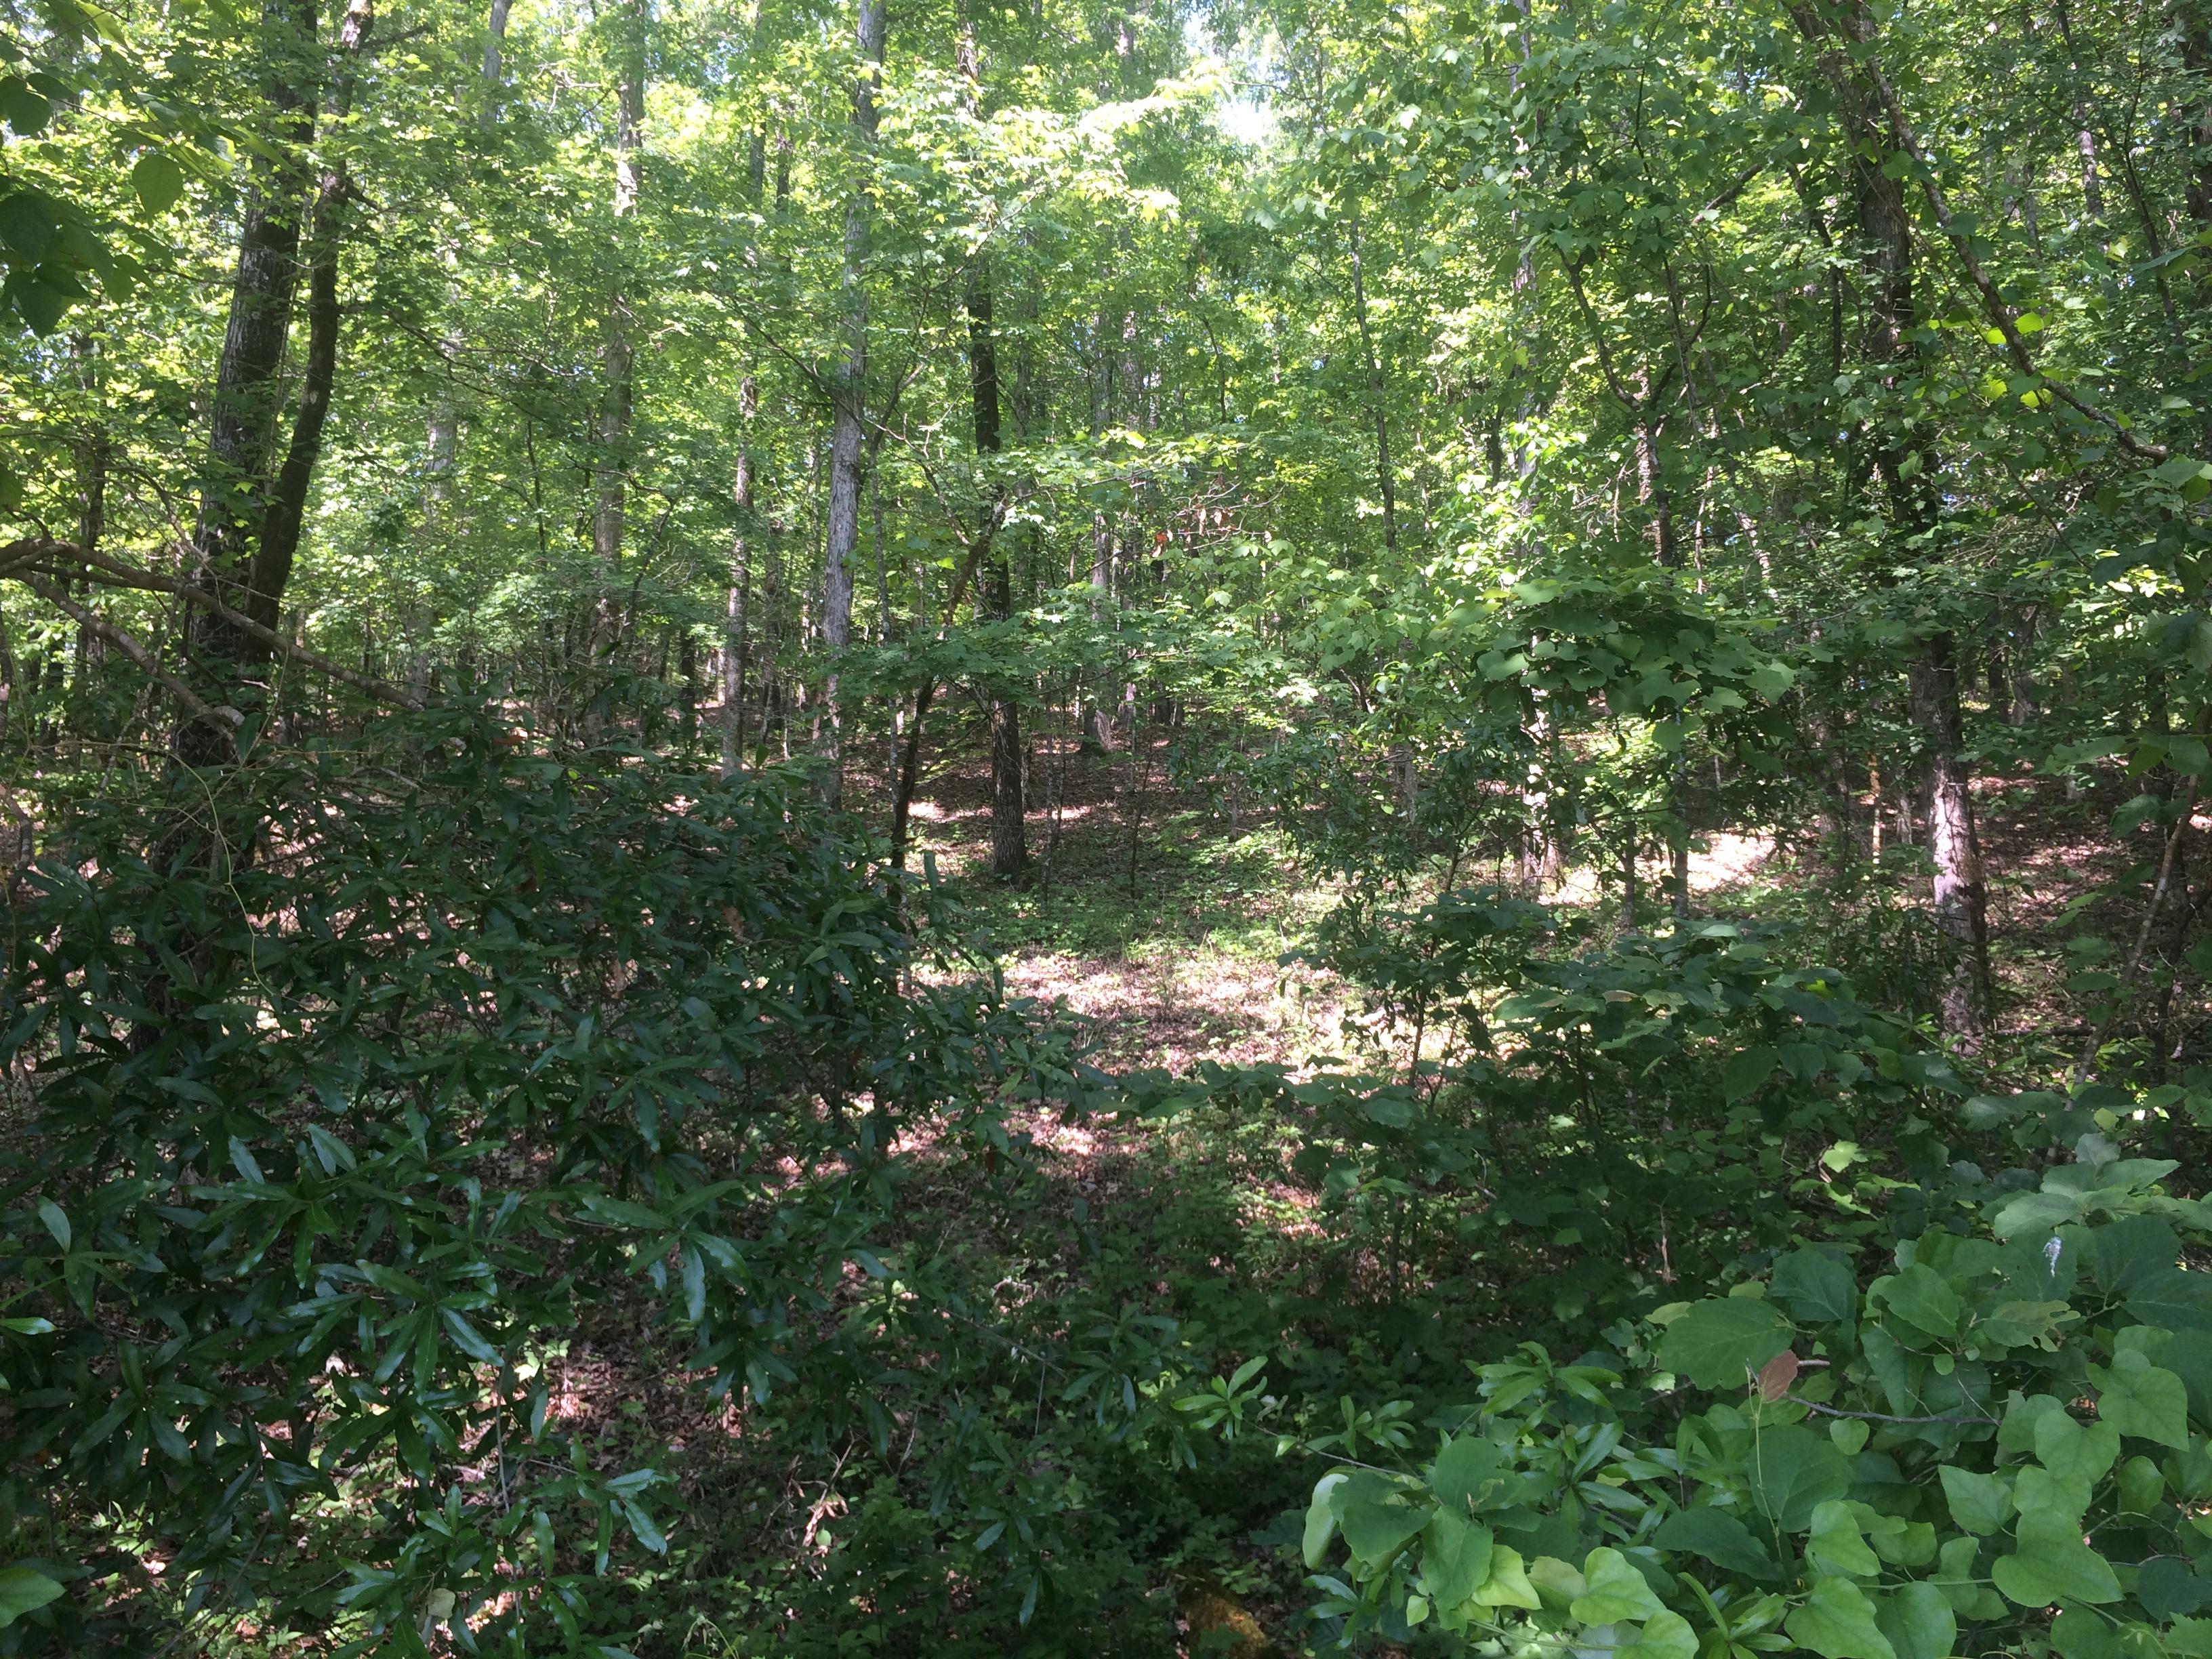 Alabama tuscaloosa county duncanville - Duncanville Alabama Five Acre Wooded Homesite Hargrove Road